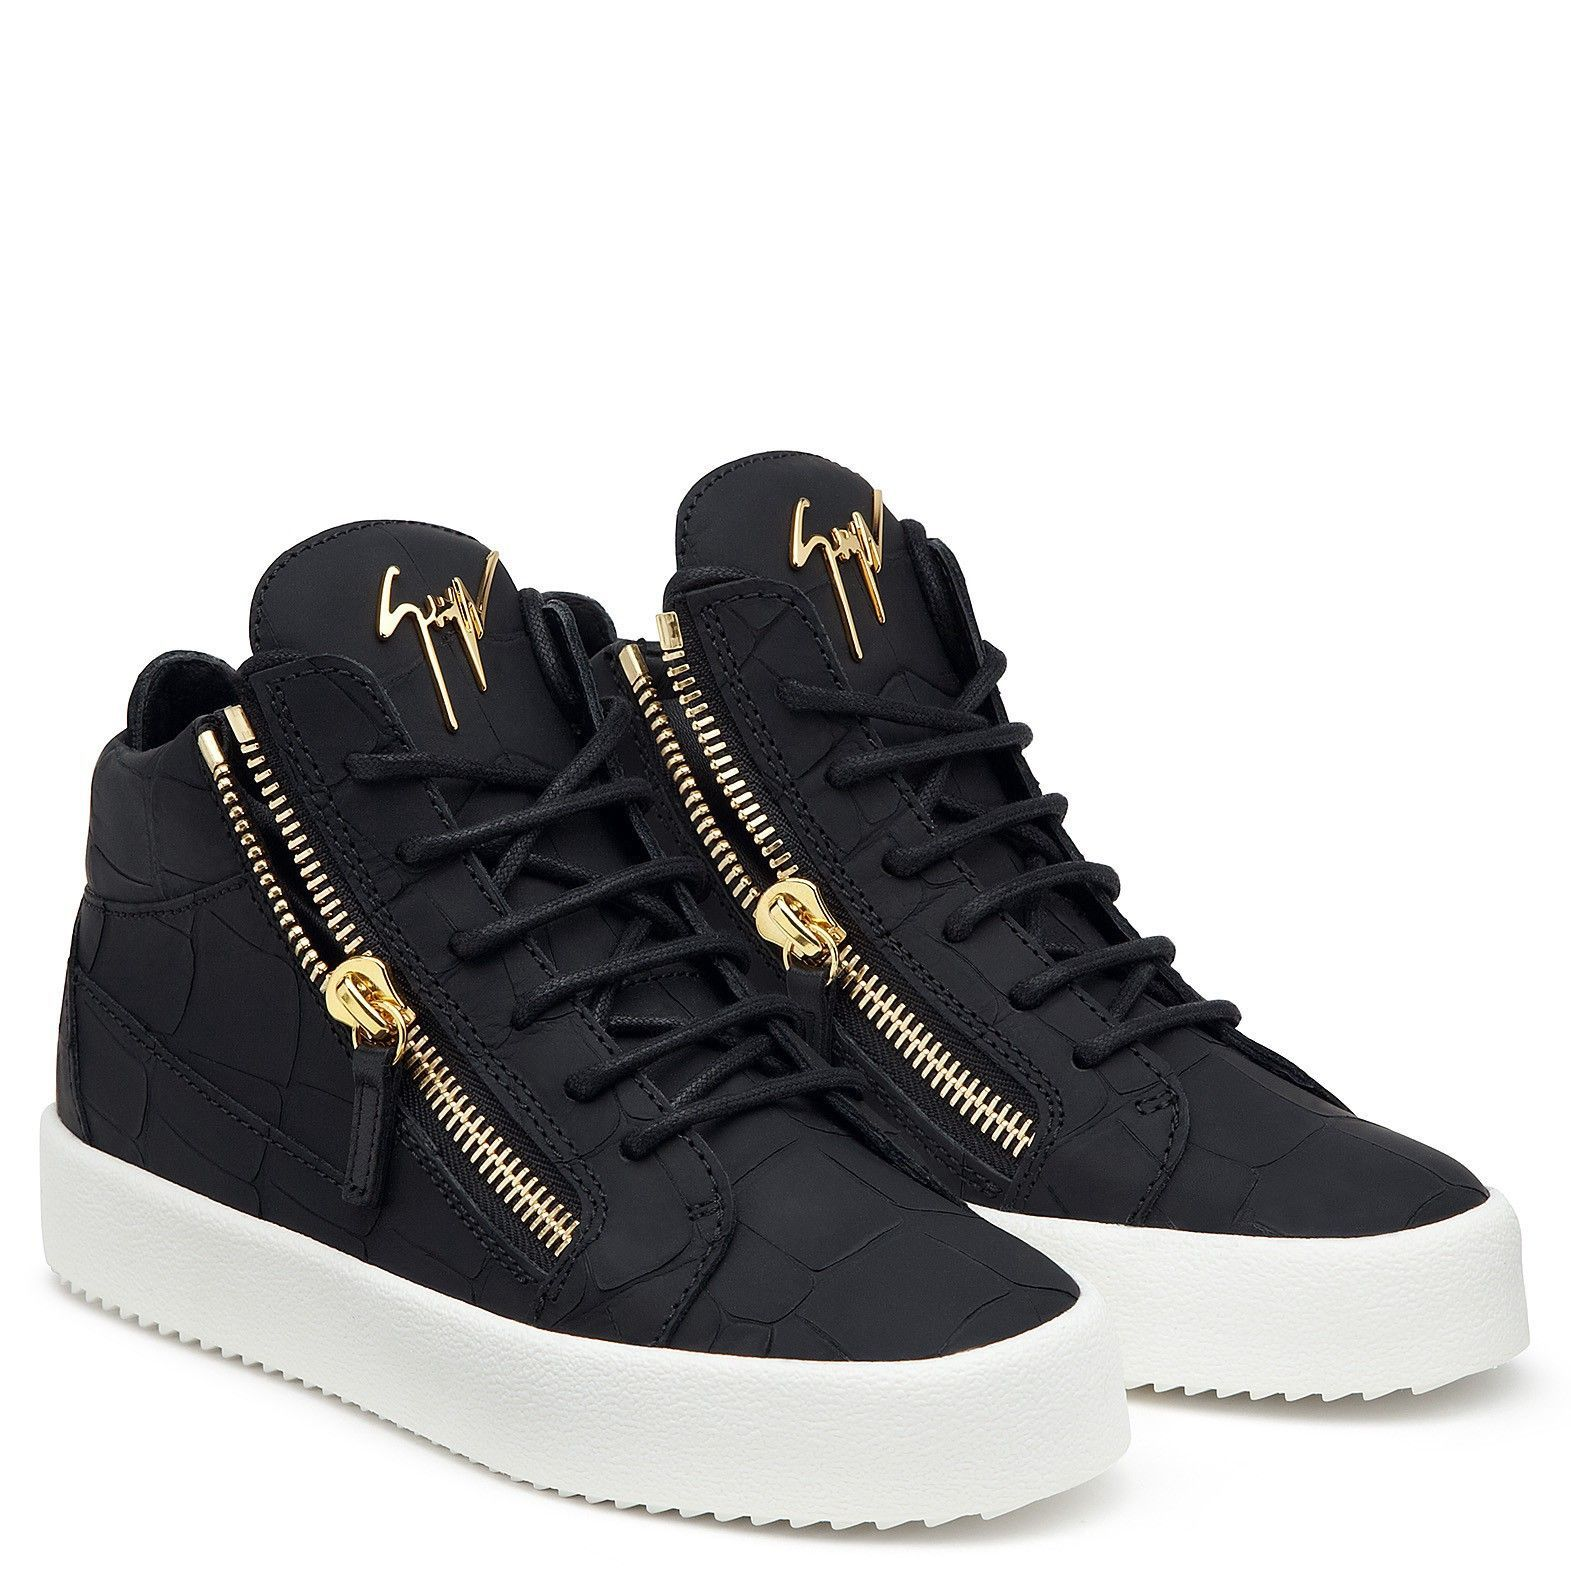 Giuseppe Zanotti Kriss Black Us6,5 (It36,5) | Tie shoes